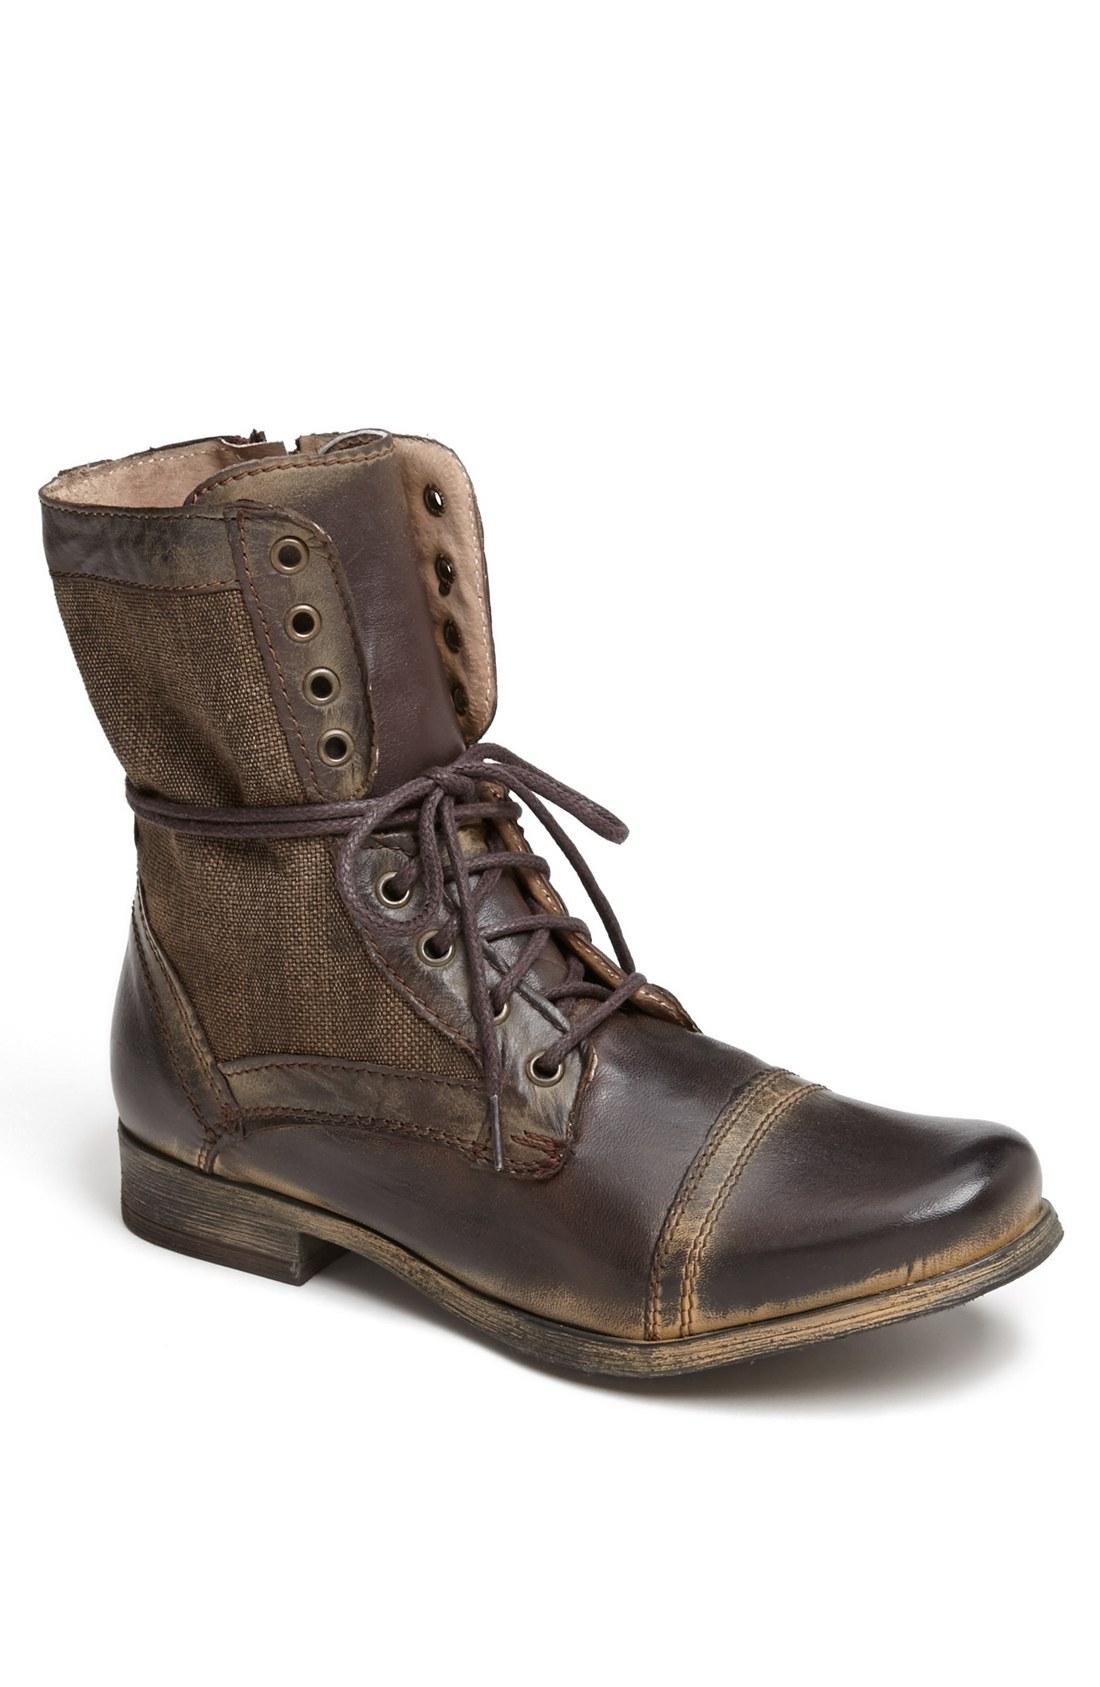 steve madden trackker cap toe boot in brown for brown